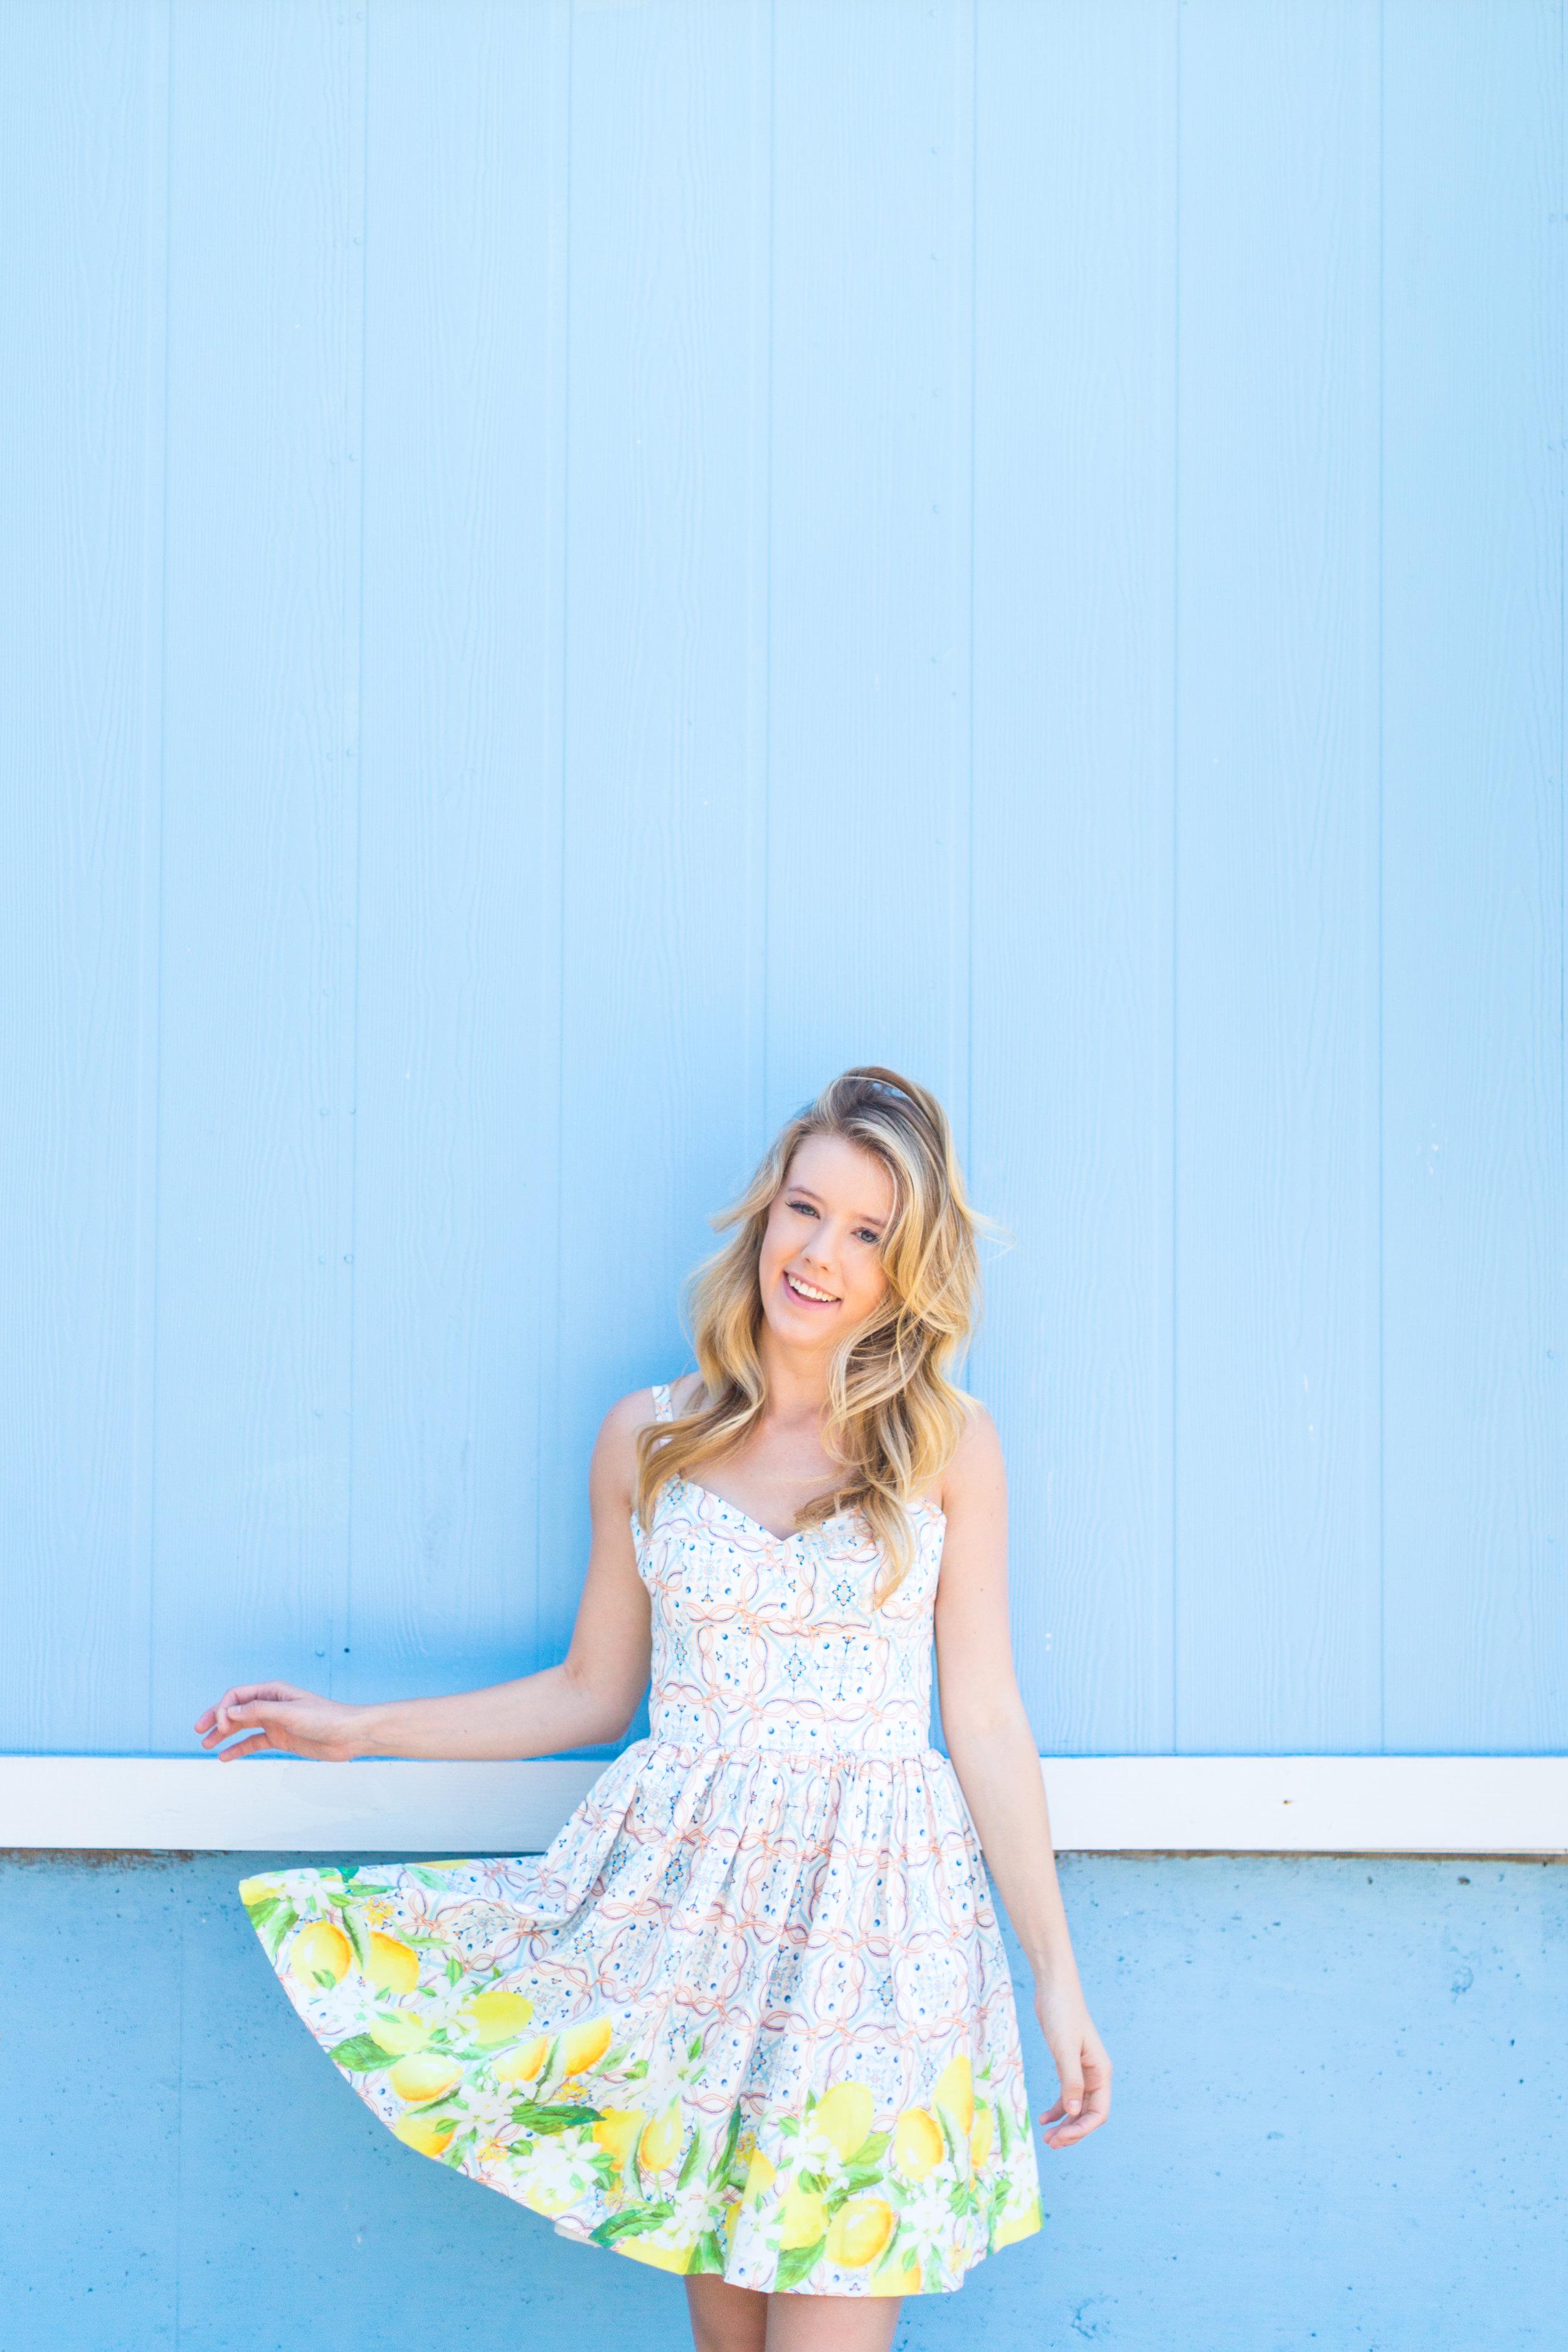 Lemon Tile Printed Summer Dress Florida-7.jpg